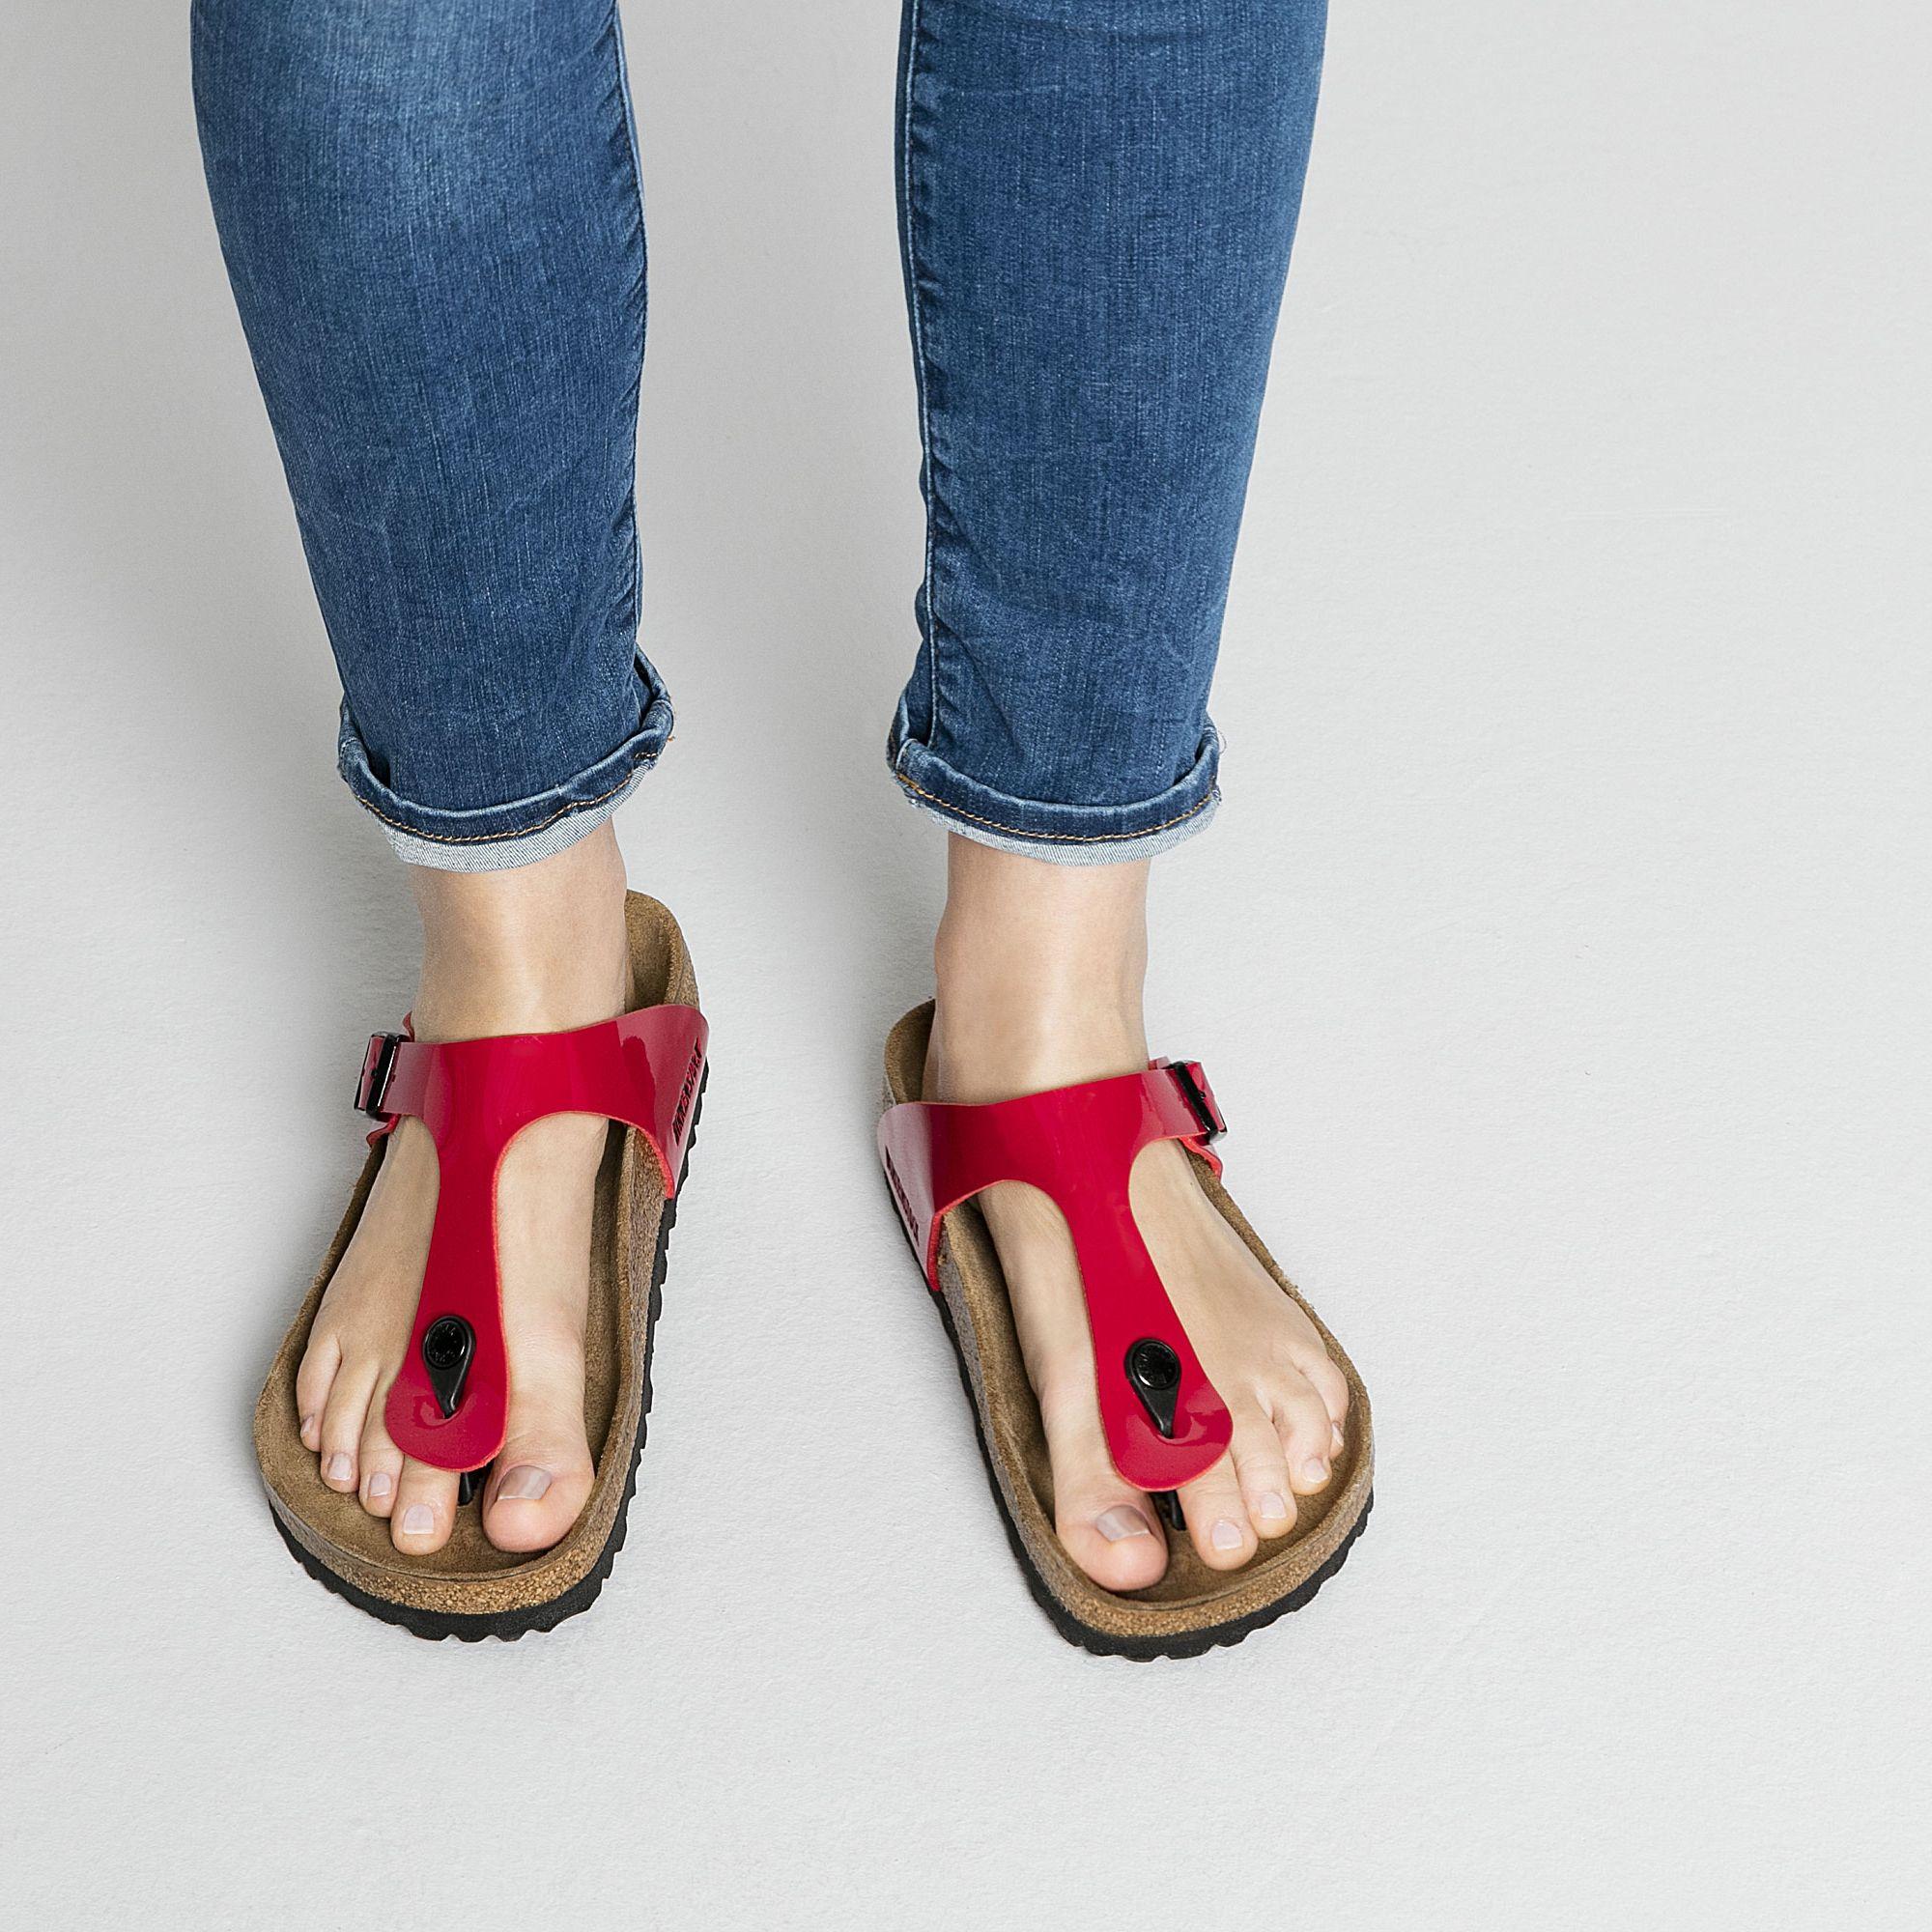 Gizeh Birko Flor Patent in 2020 | Sandals, Birkenstock, Shoes